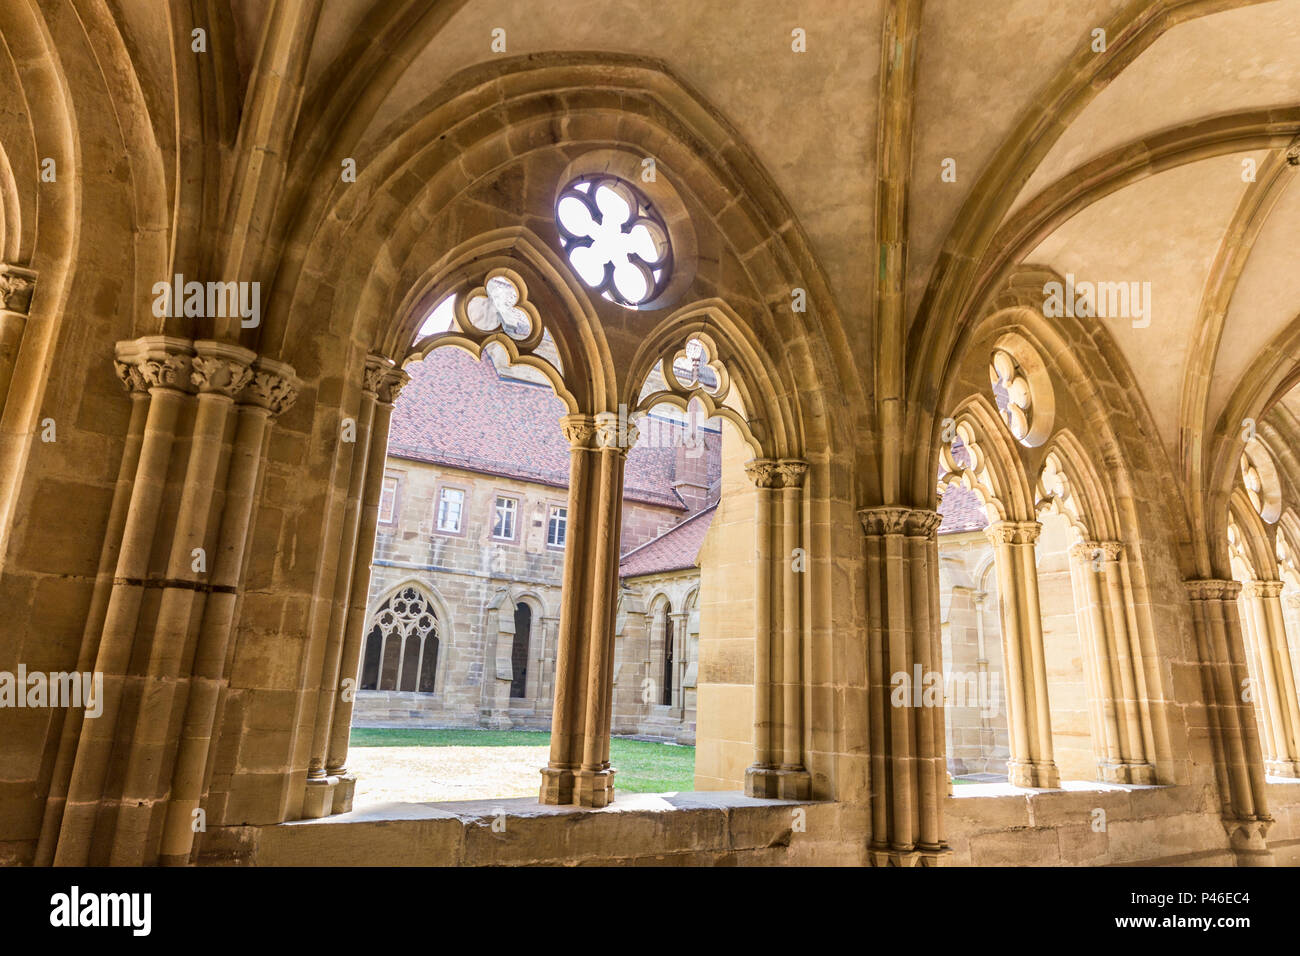 Maulbronn, Germany. Cloister of Maulbronn Monastery (Kloster Maulbronn), a former Roman Catholic Cistercian Abbey. World Heritage Site since 1993 Stock Photo